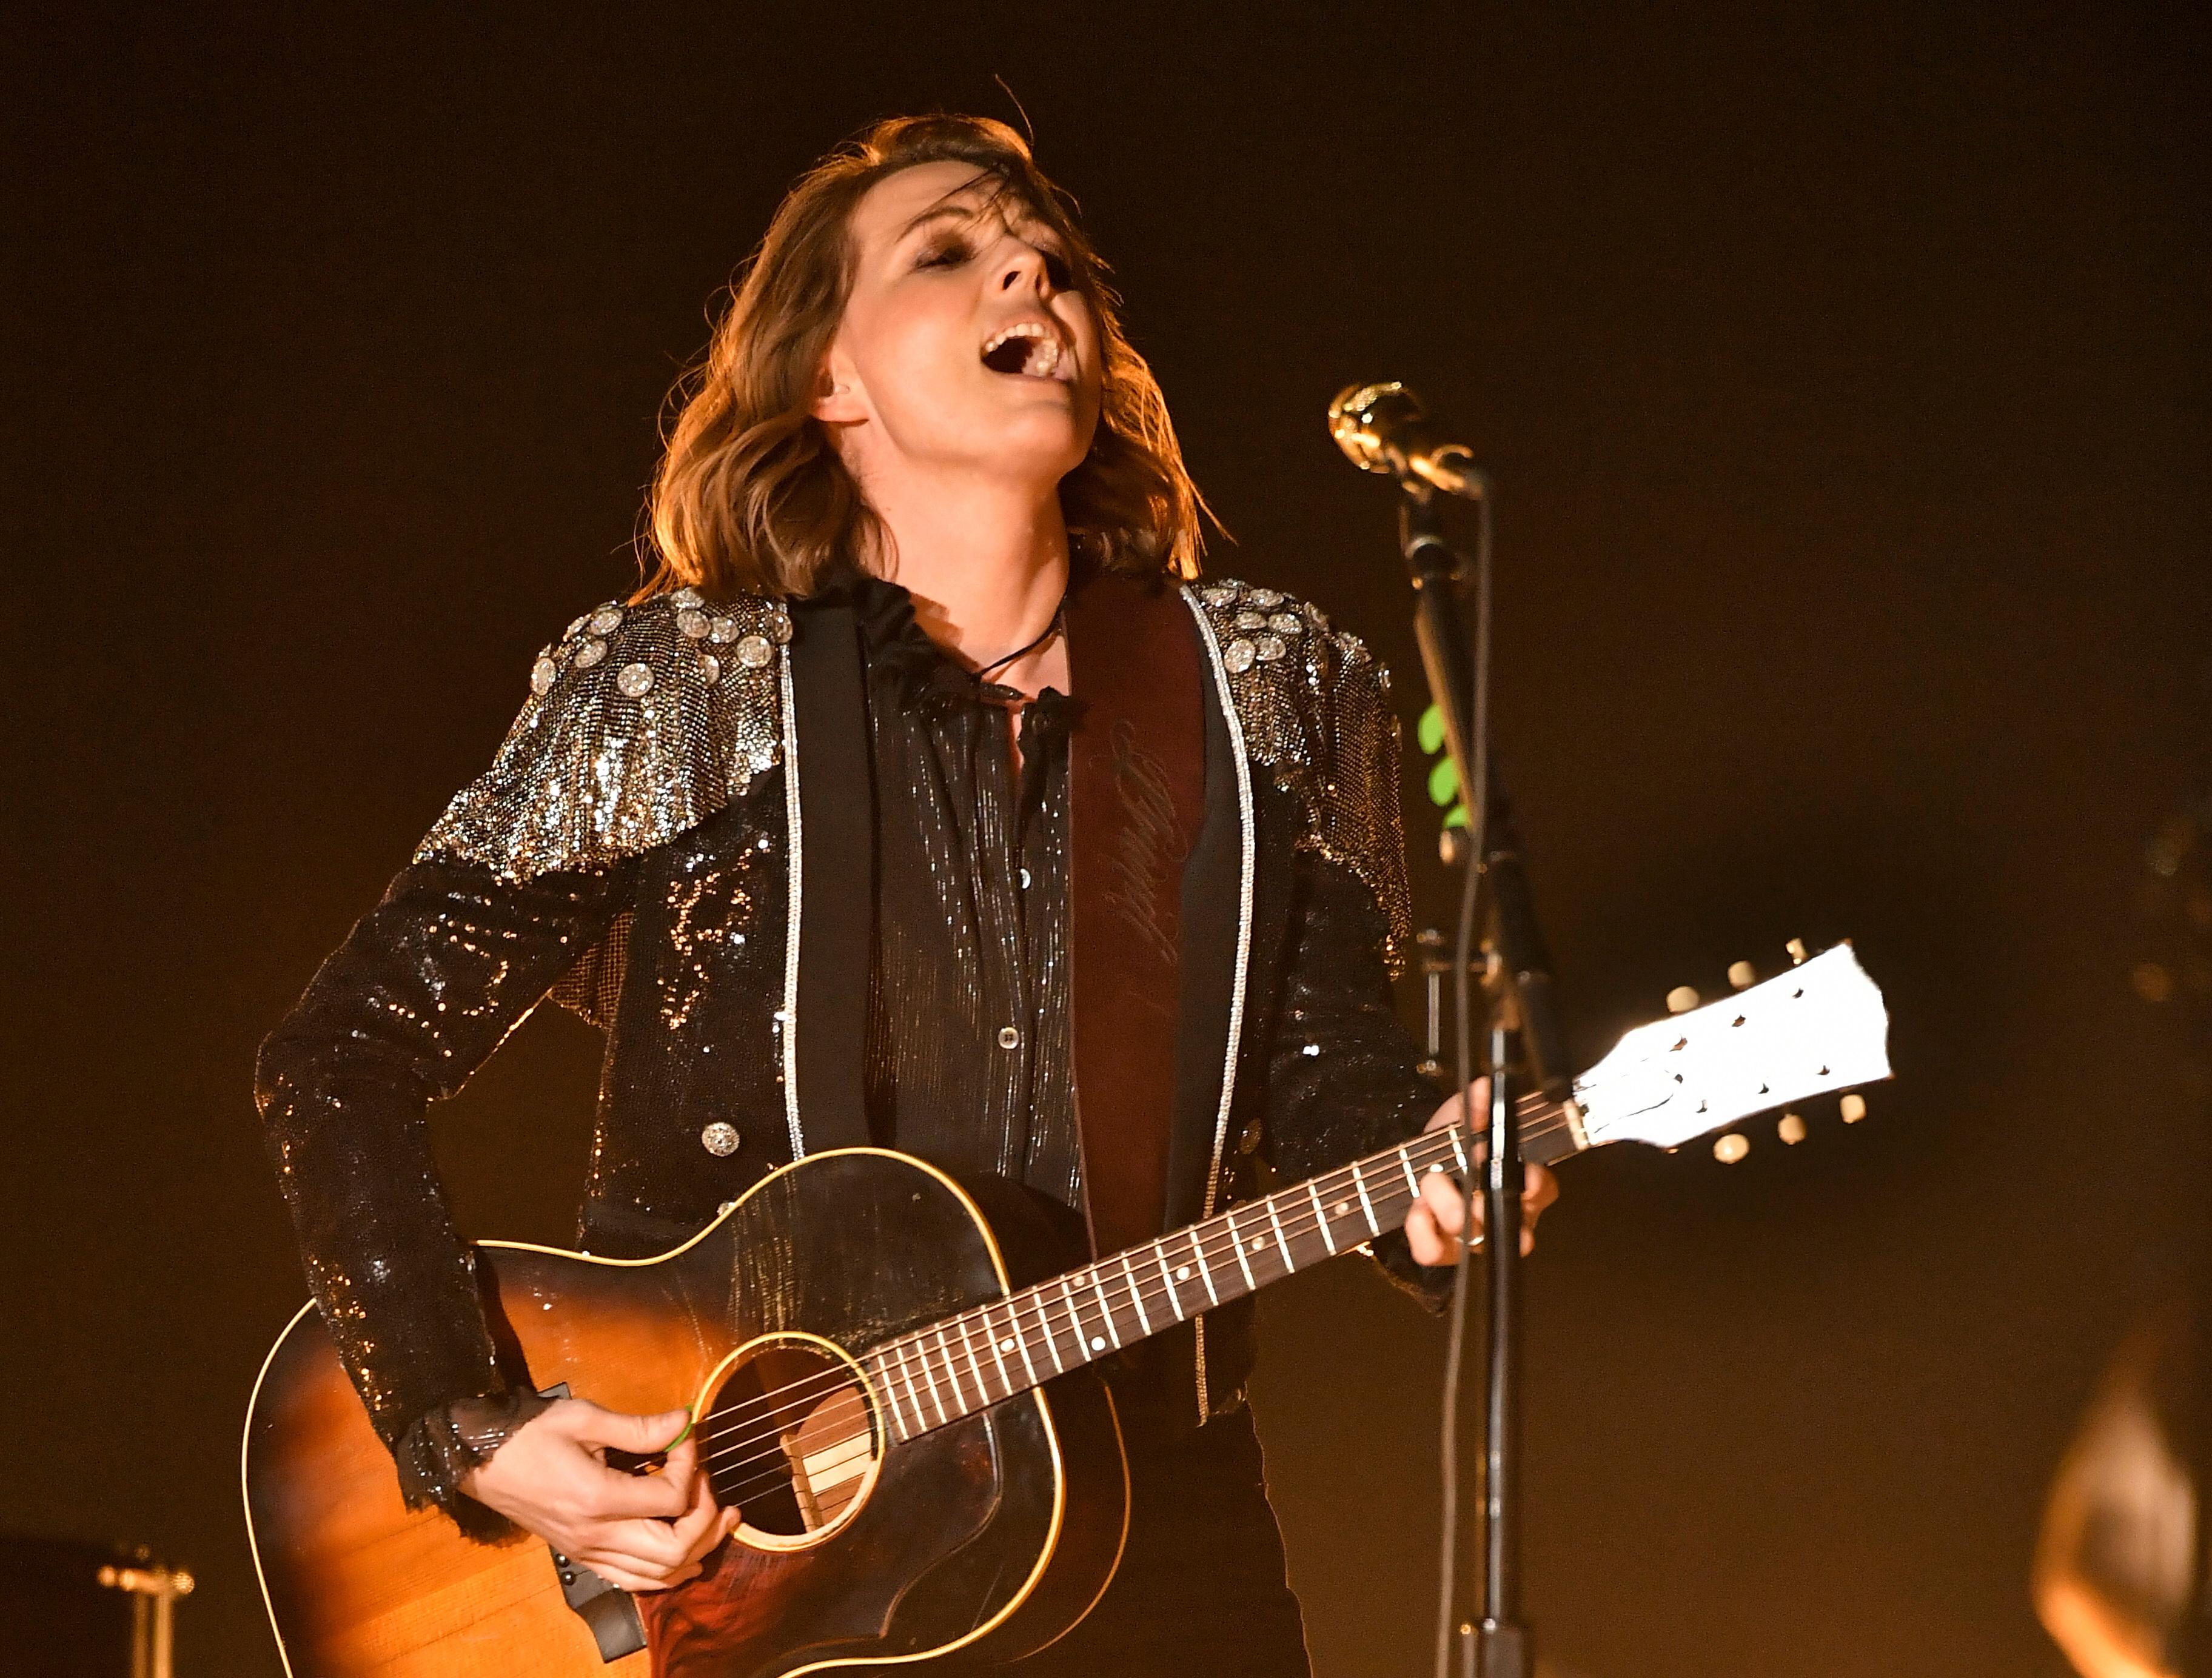 Grammys 2019: Brandi Carlile Sings 'The Joke' – Rolling Stone